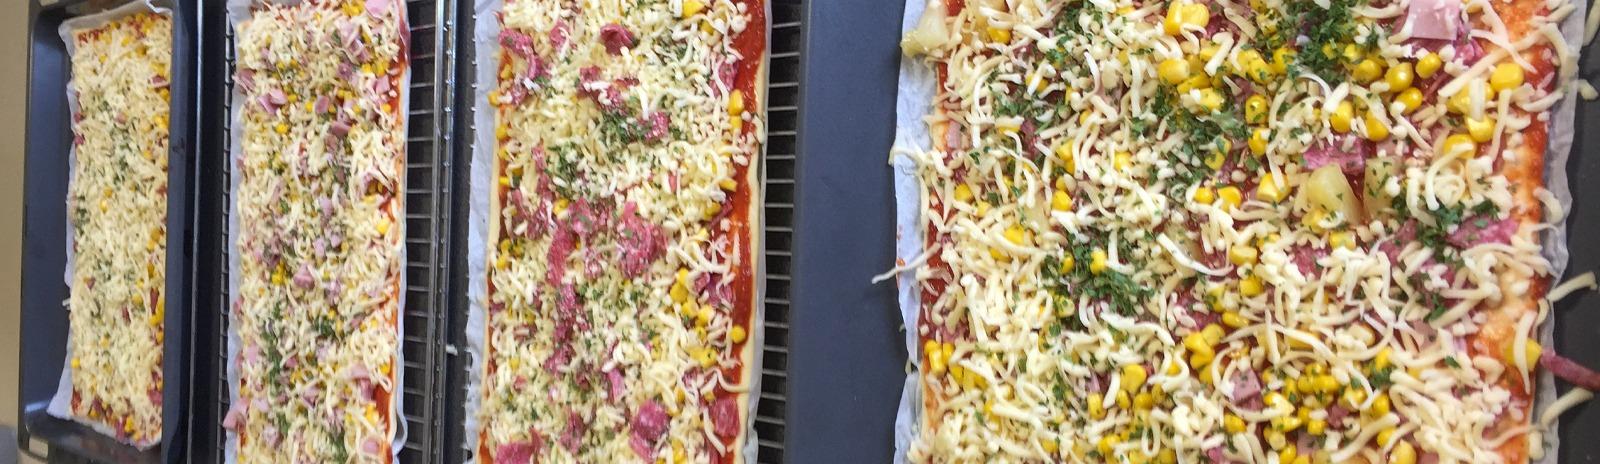 Haus Marienhöhe_Pizza1_slider